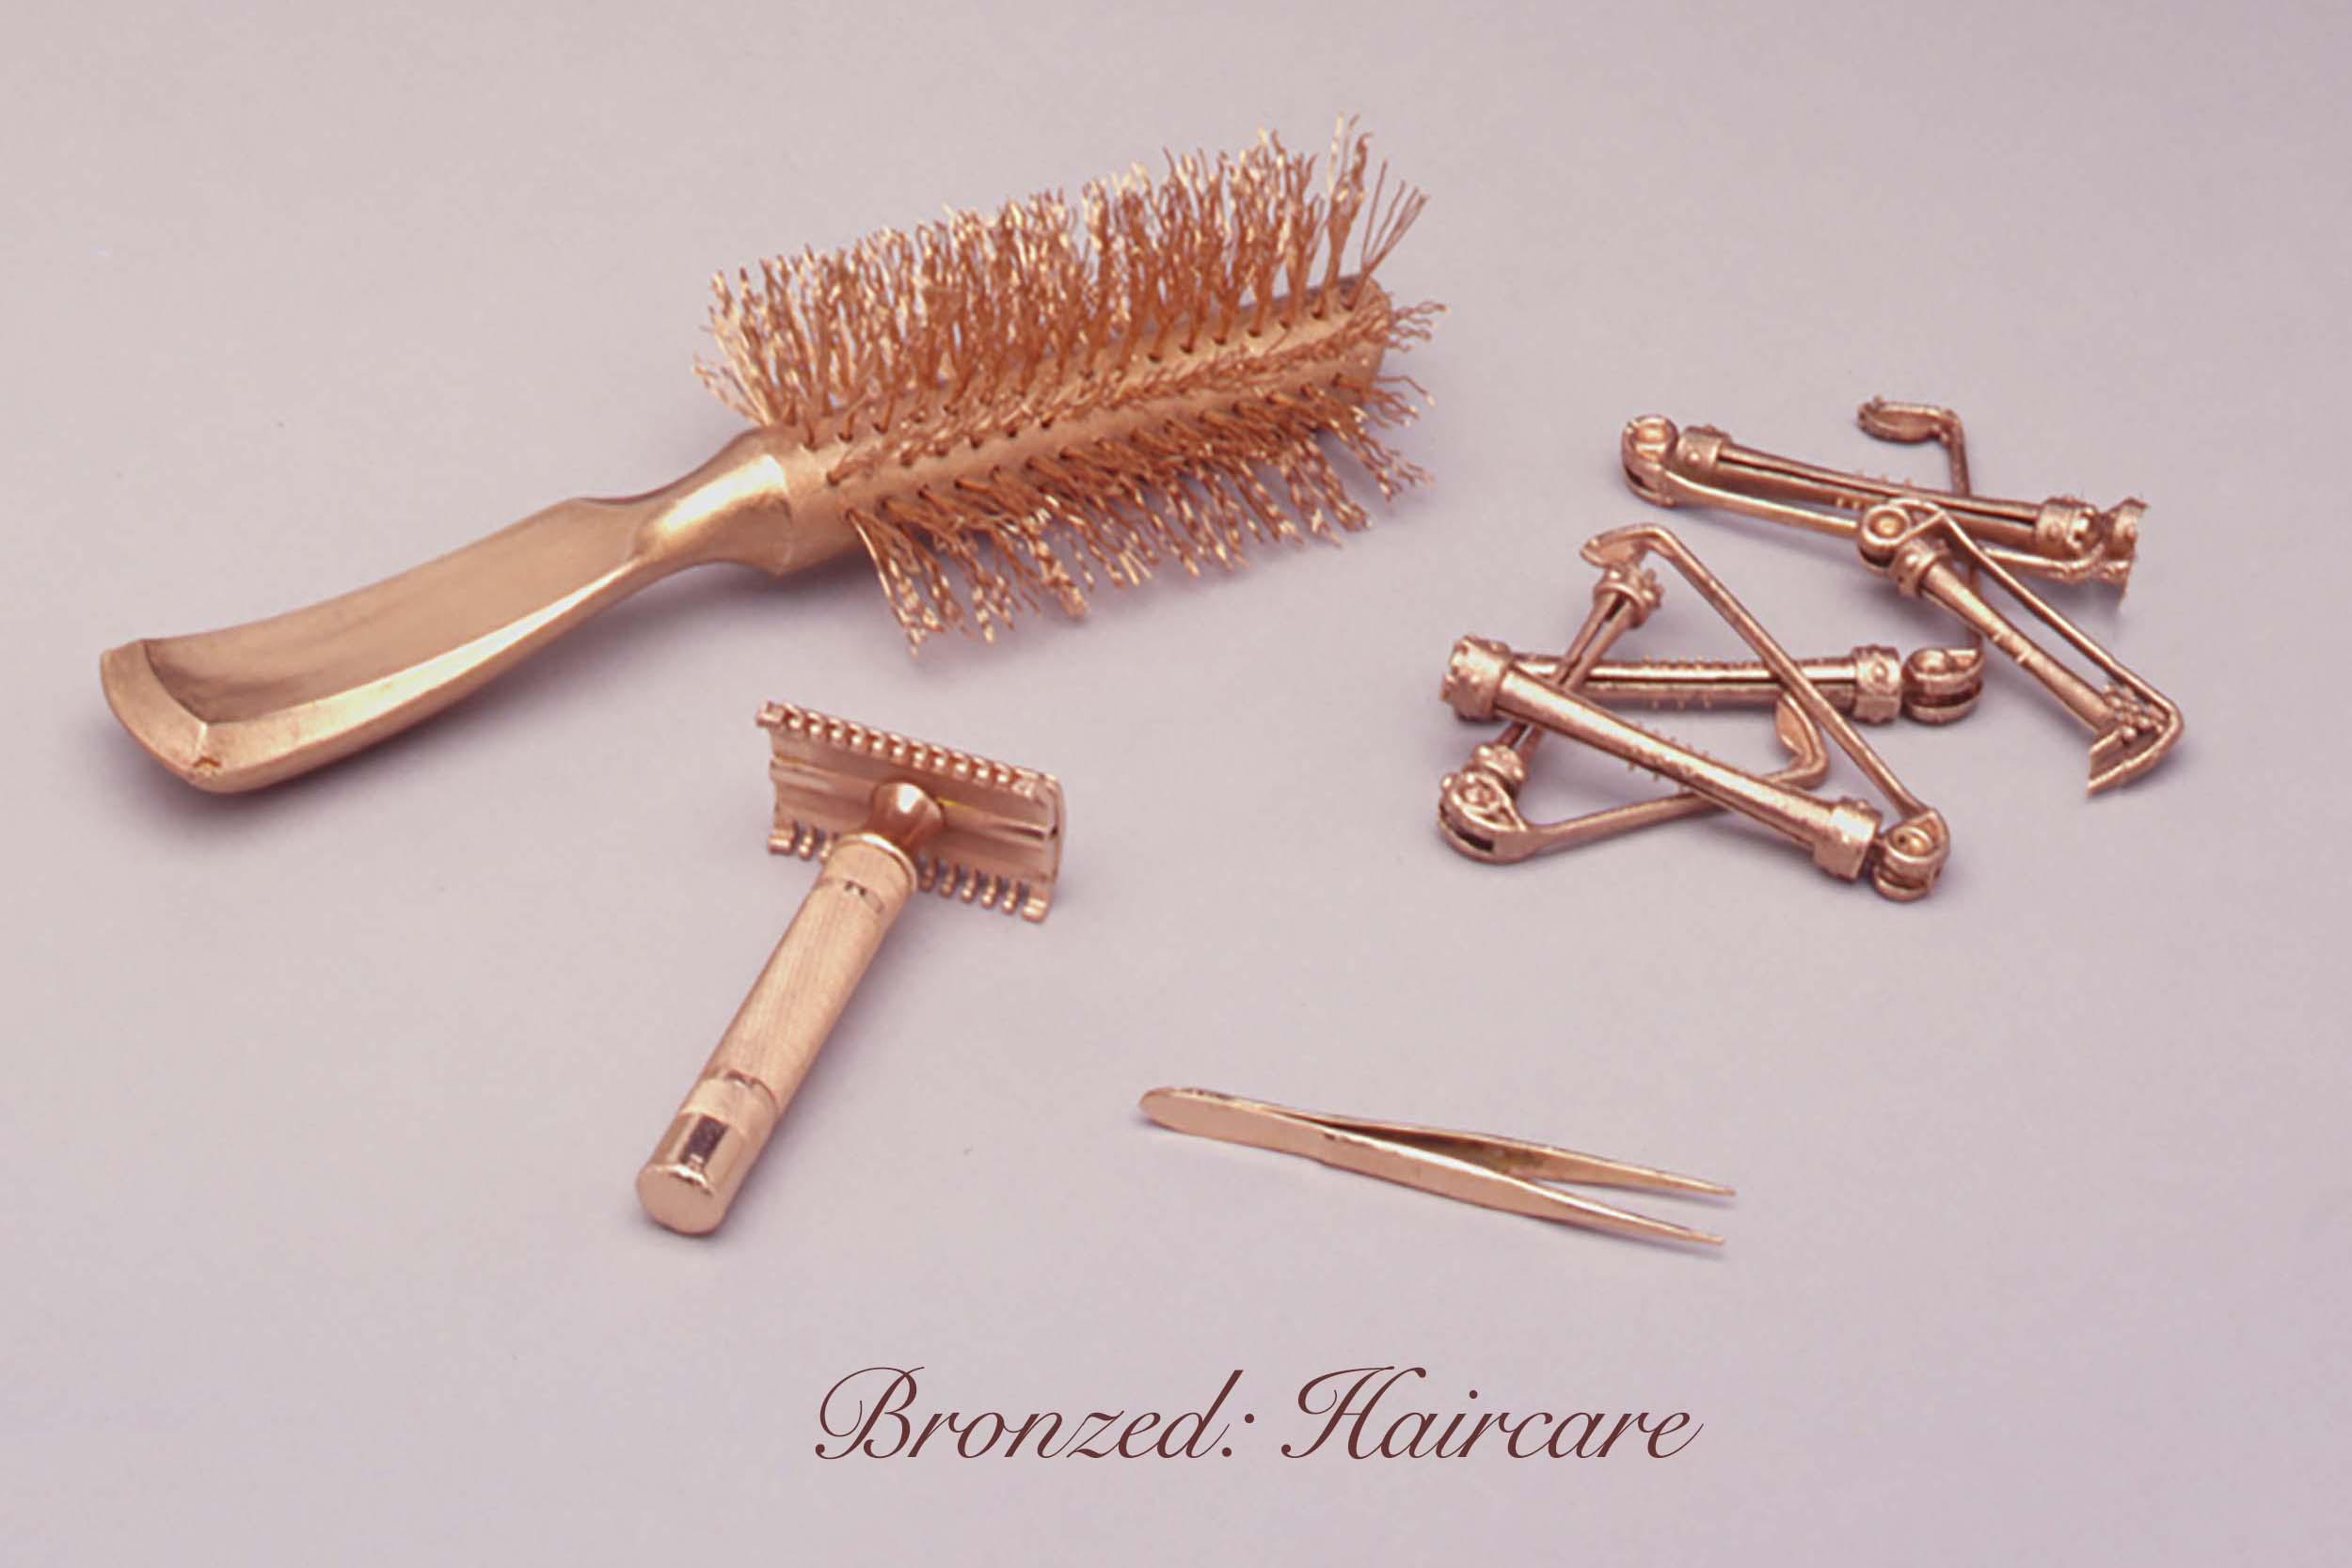 Bronzed-Haircare-ps-txt.jpg